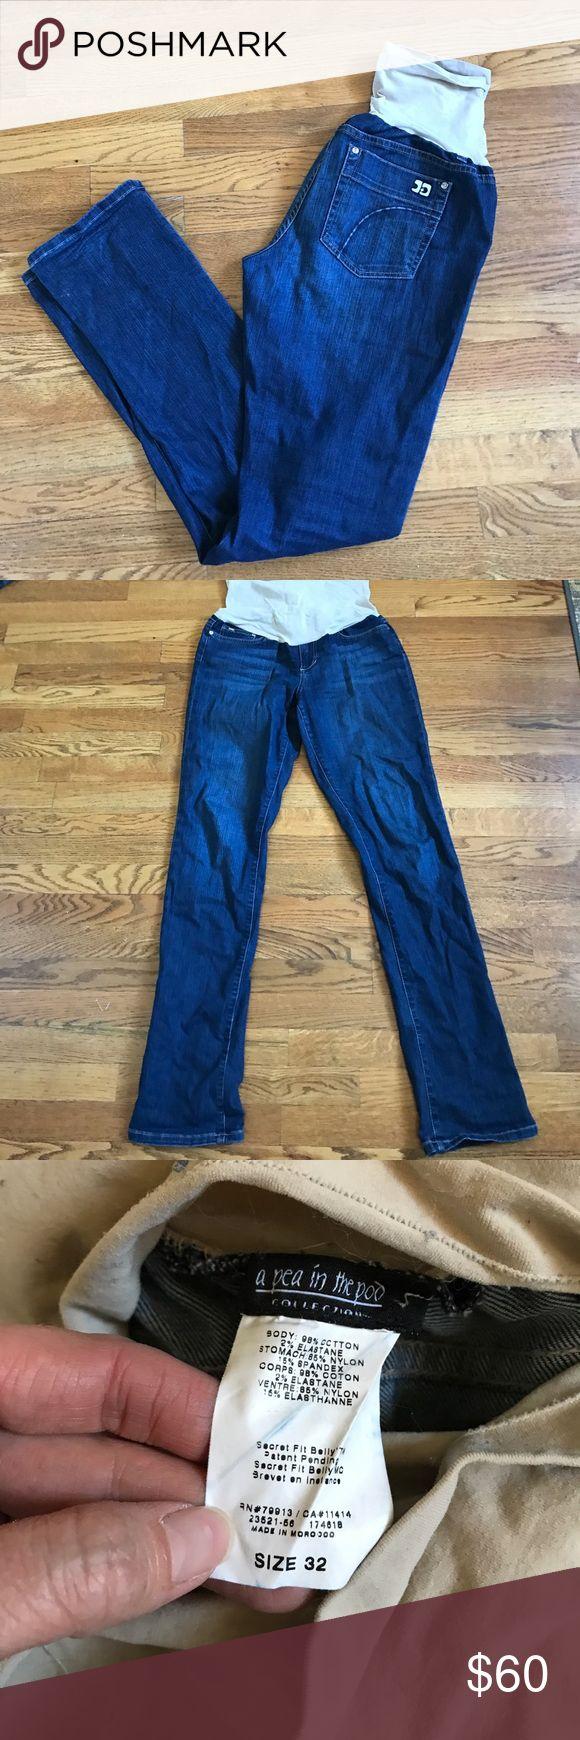 25  best ideas about Maternity jeans on Pinterest | Maternity wear ...